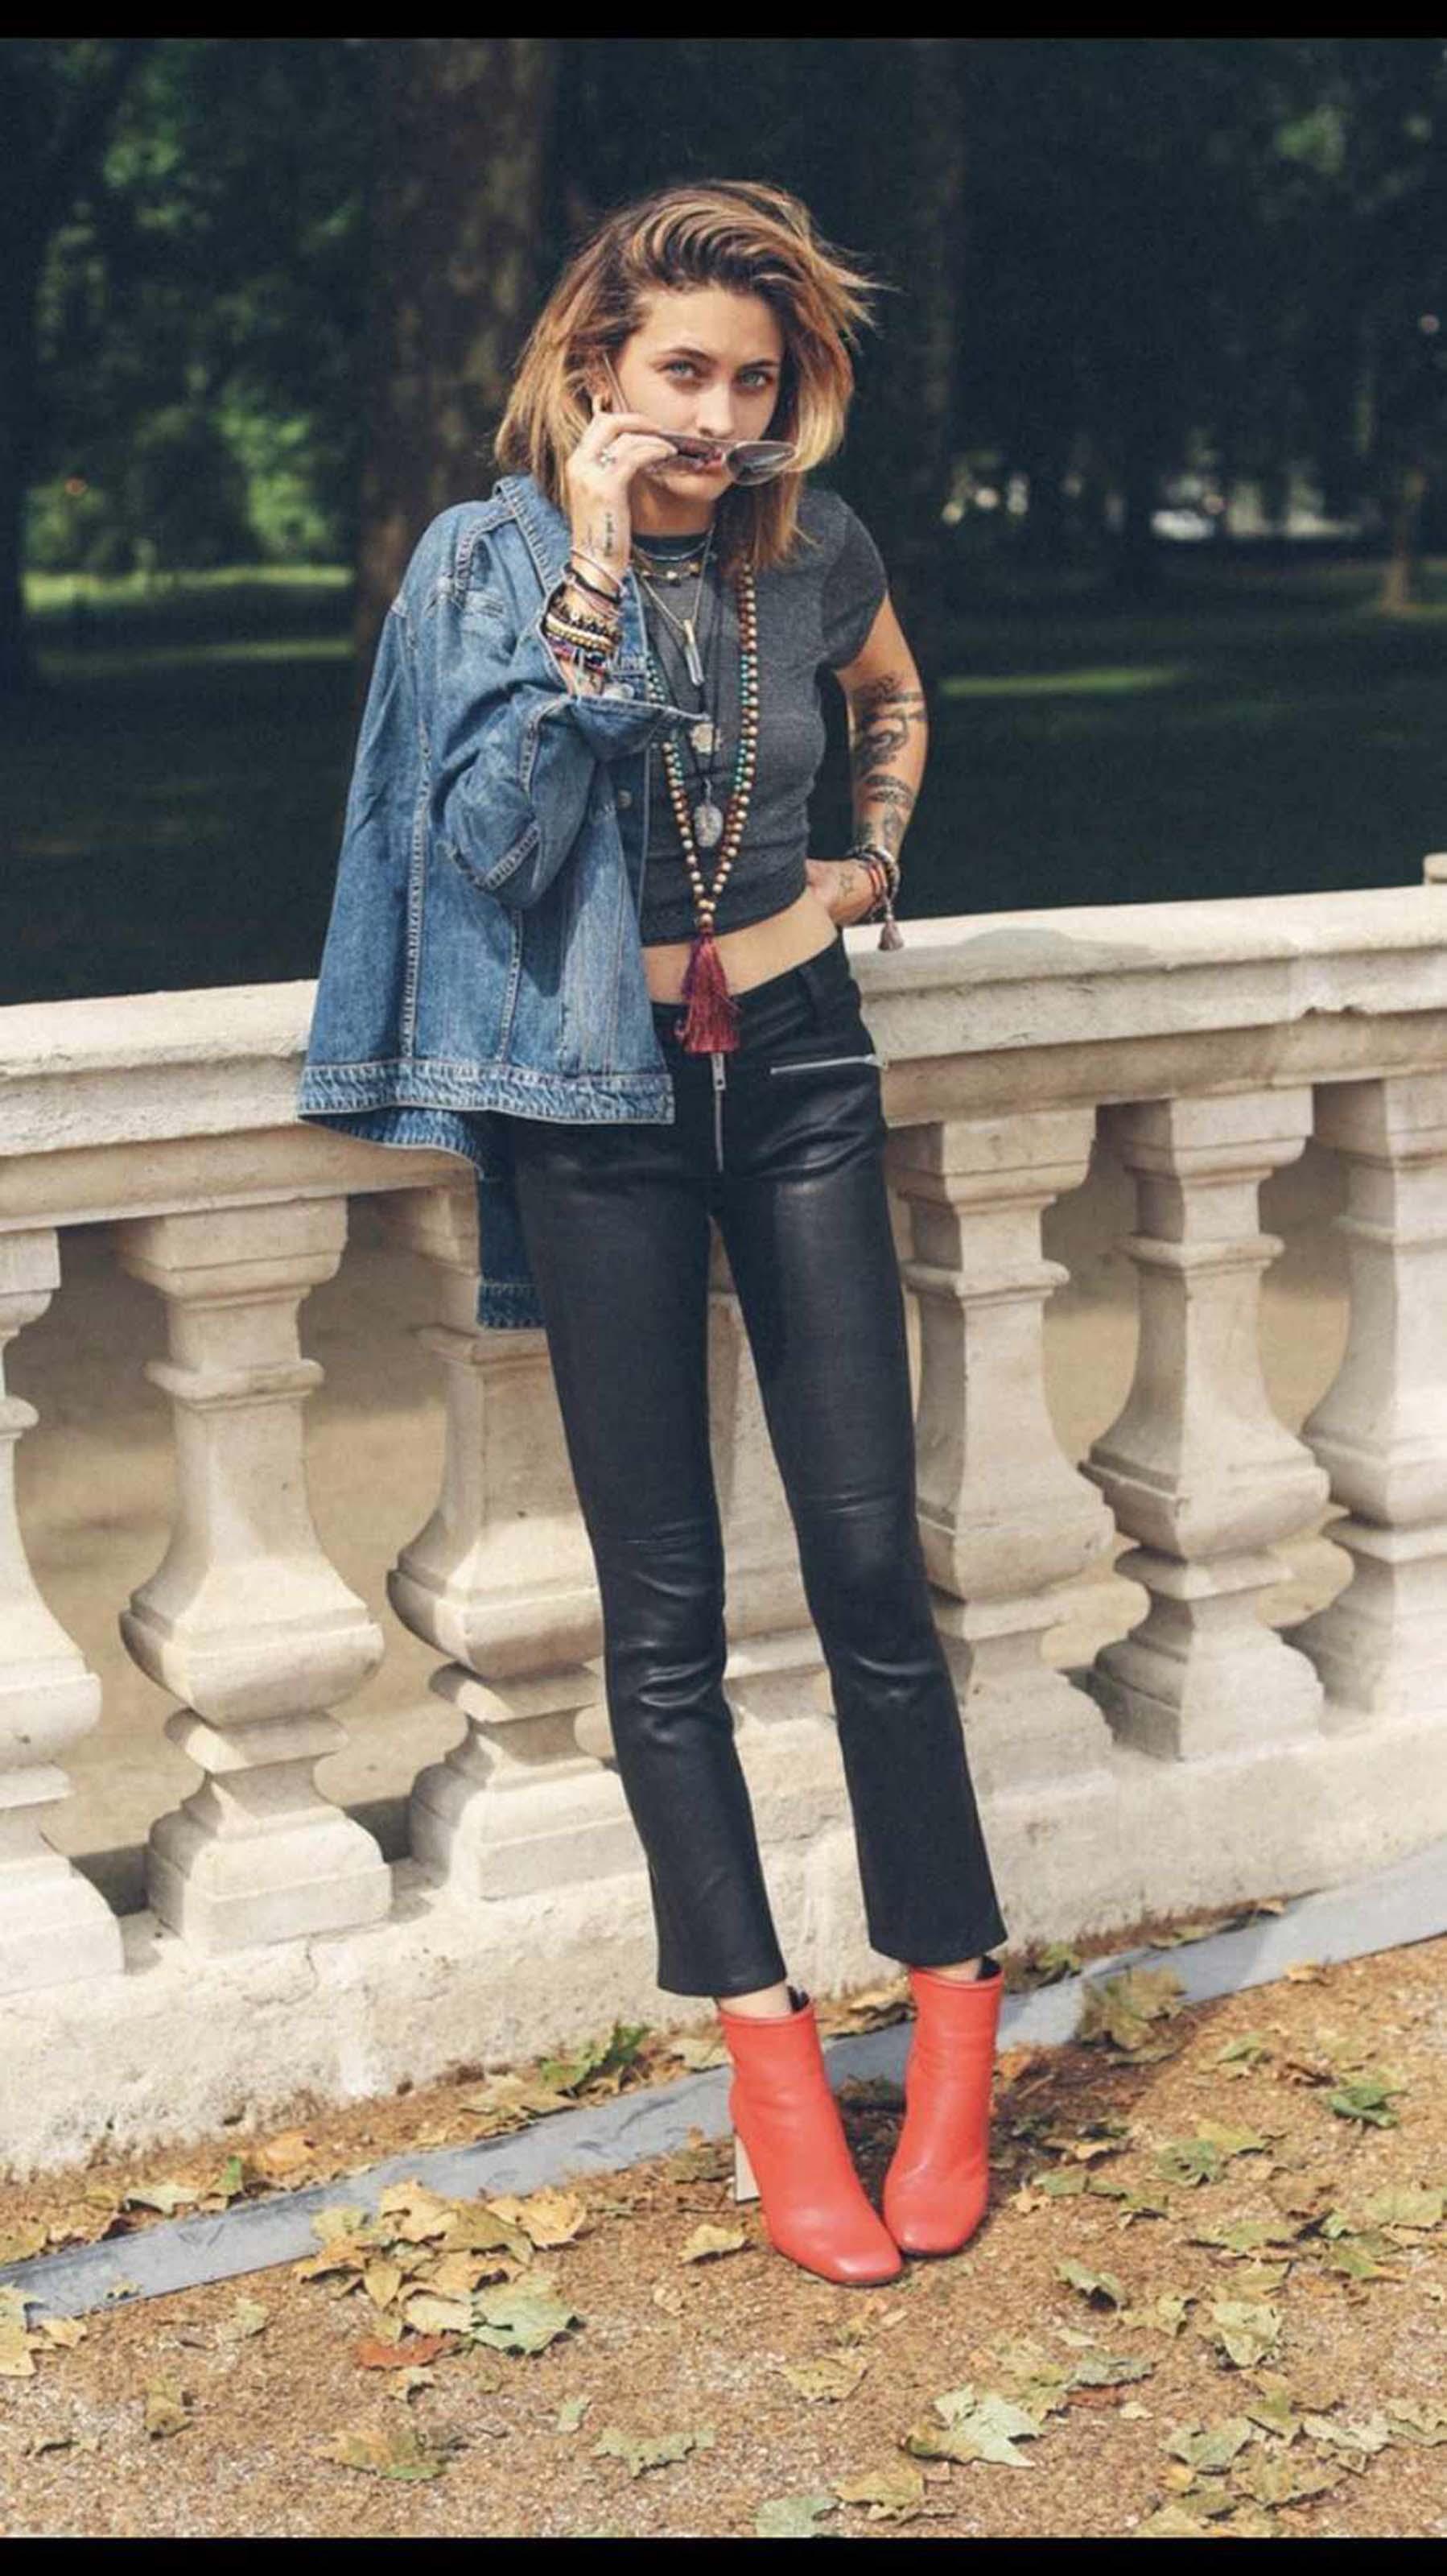 Paris Jackson photoshooting for Rag & Bone